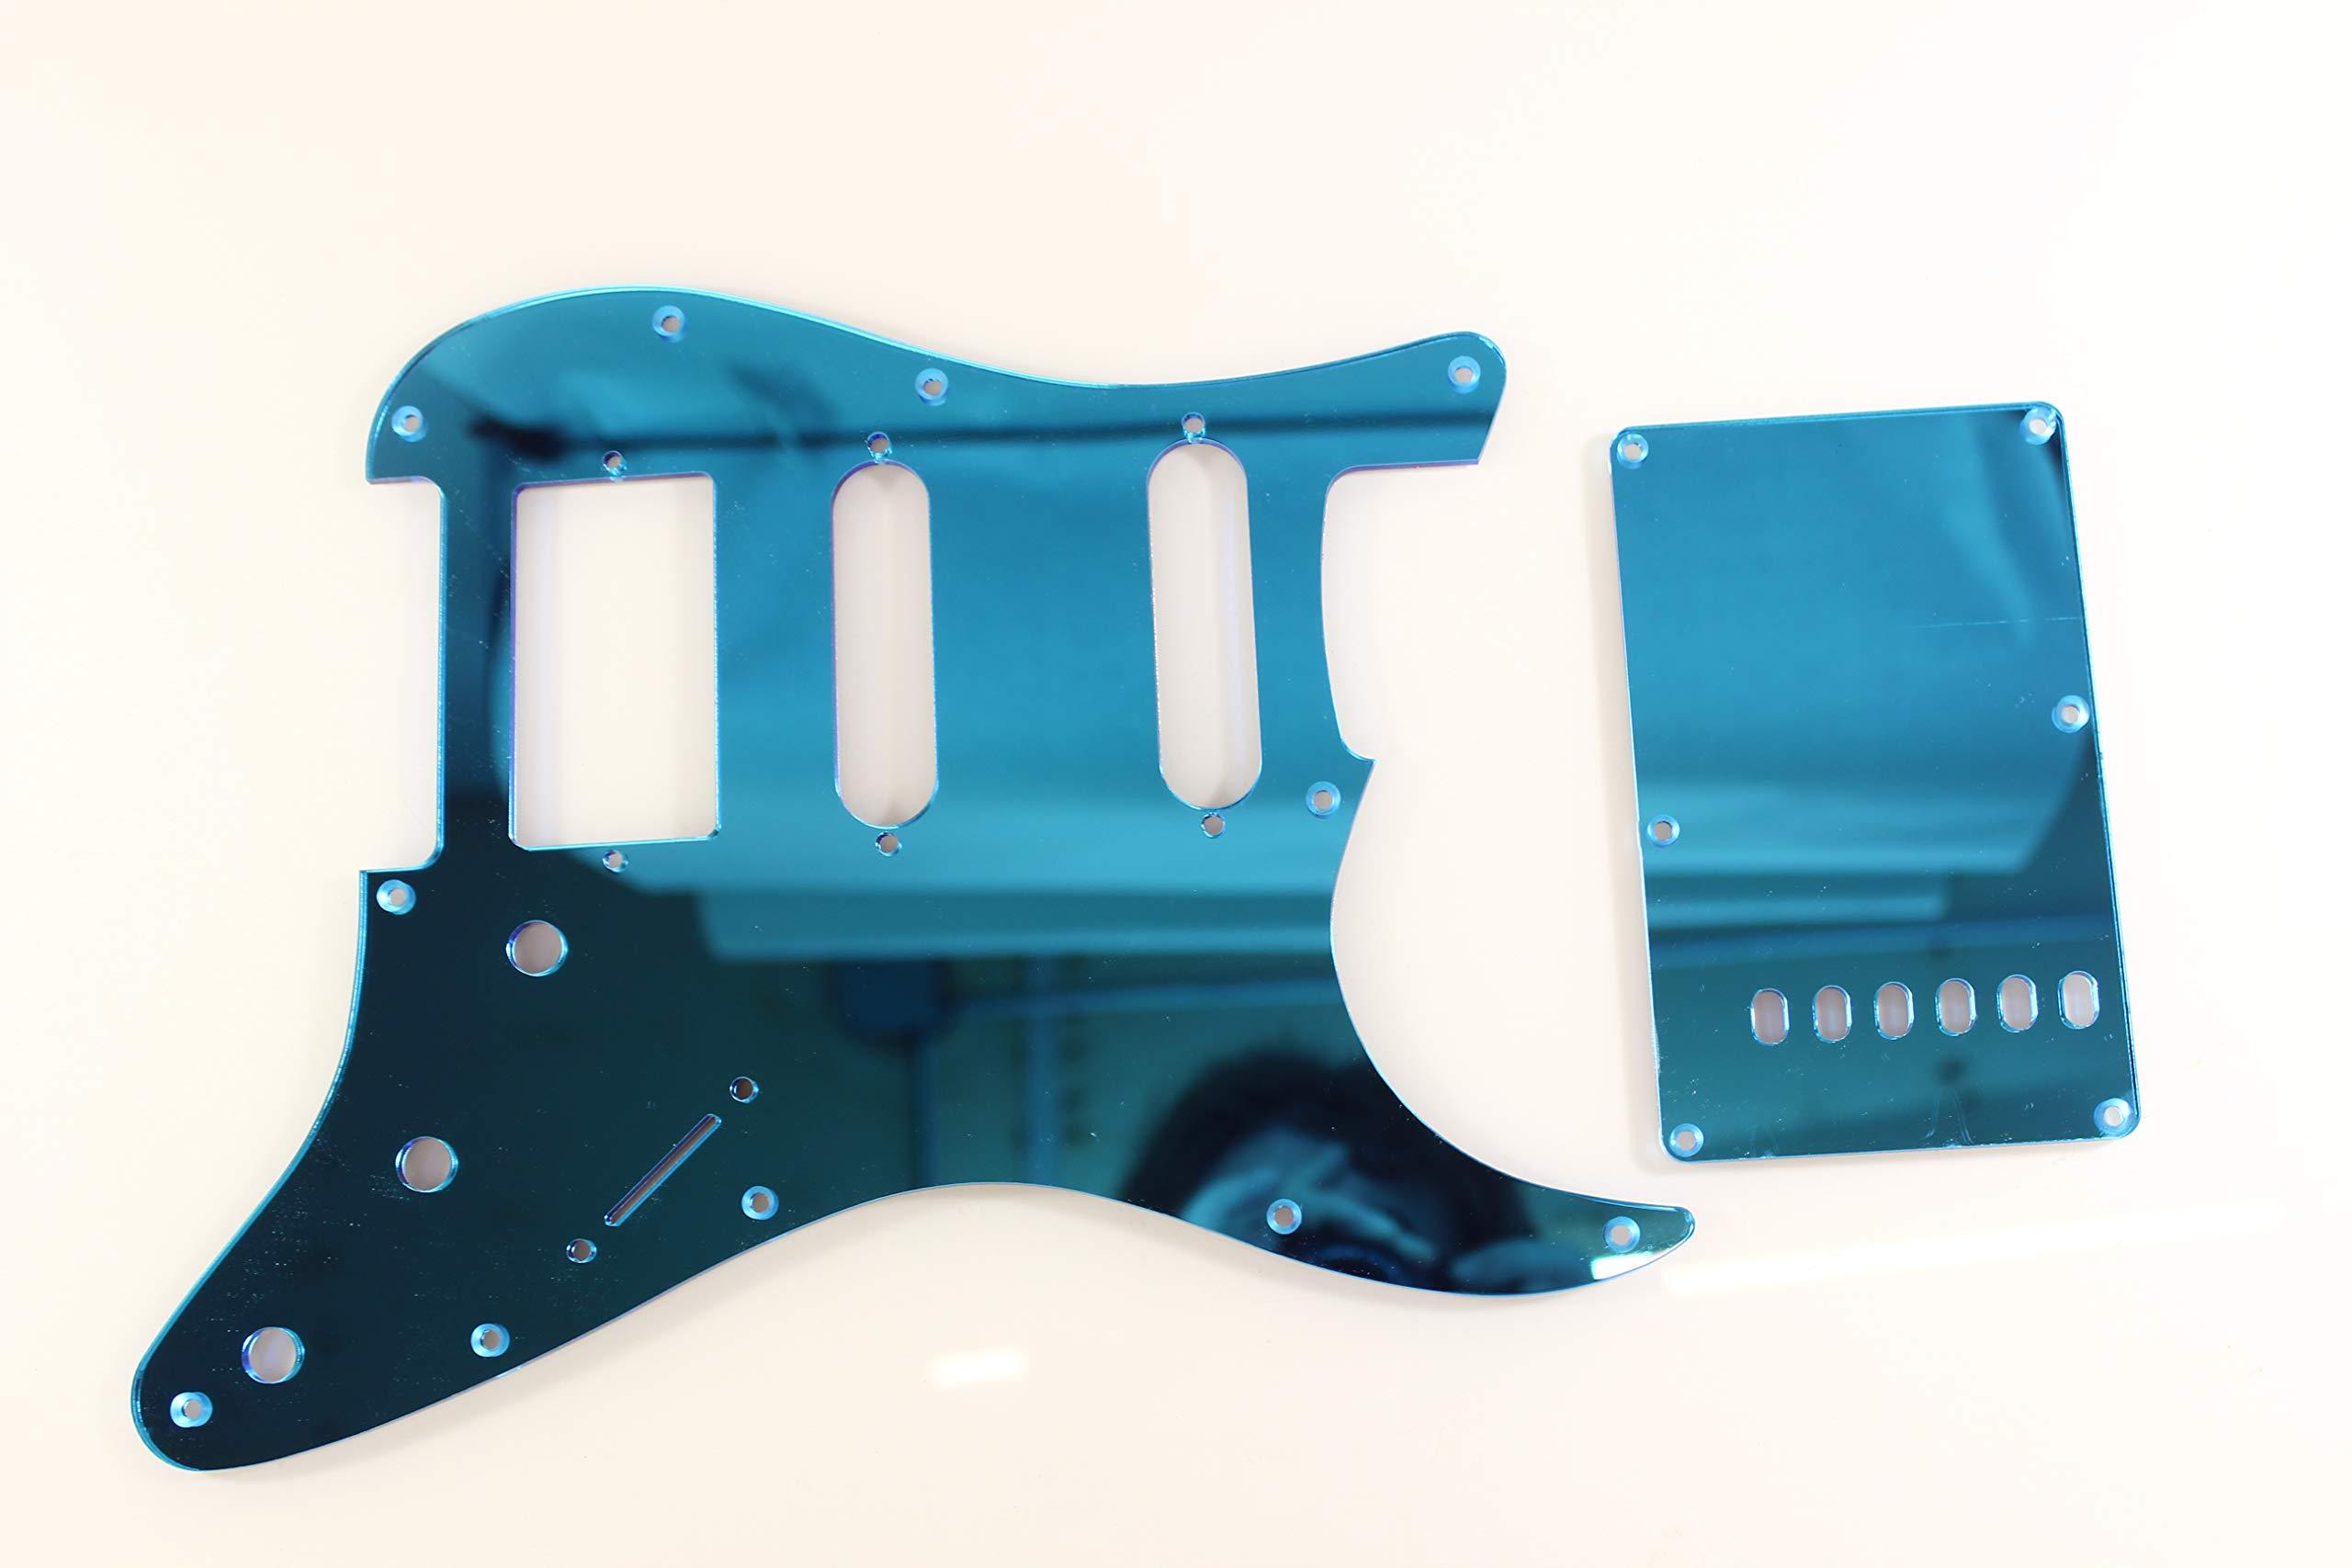 Blue Mirror Acrylic (plastic) HSS Pickguard Set Fits Fender Stratocaster Strat